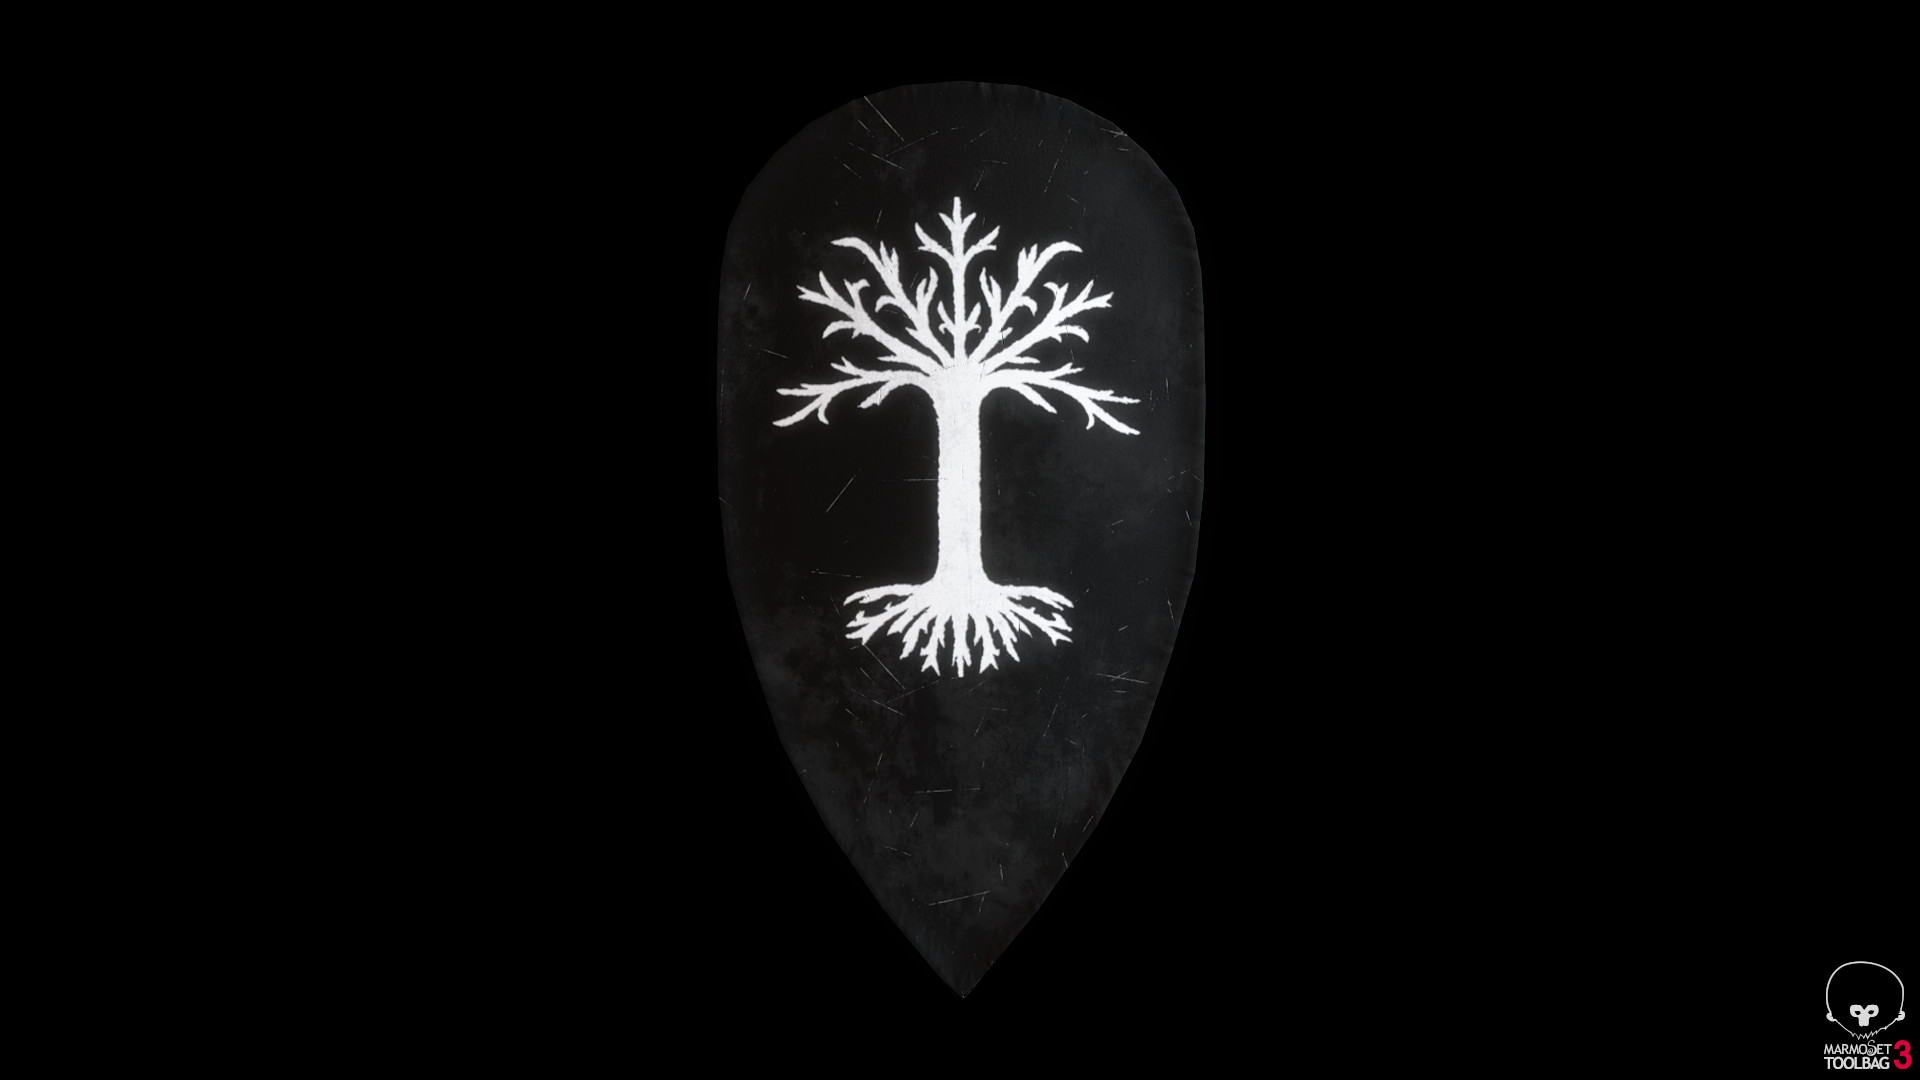 Bela csampai s4h gondorian shield 01 preview mt 02